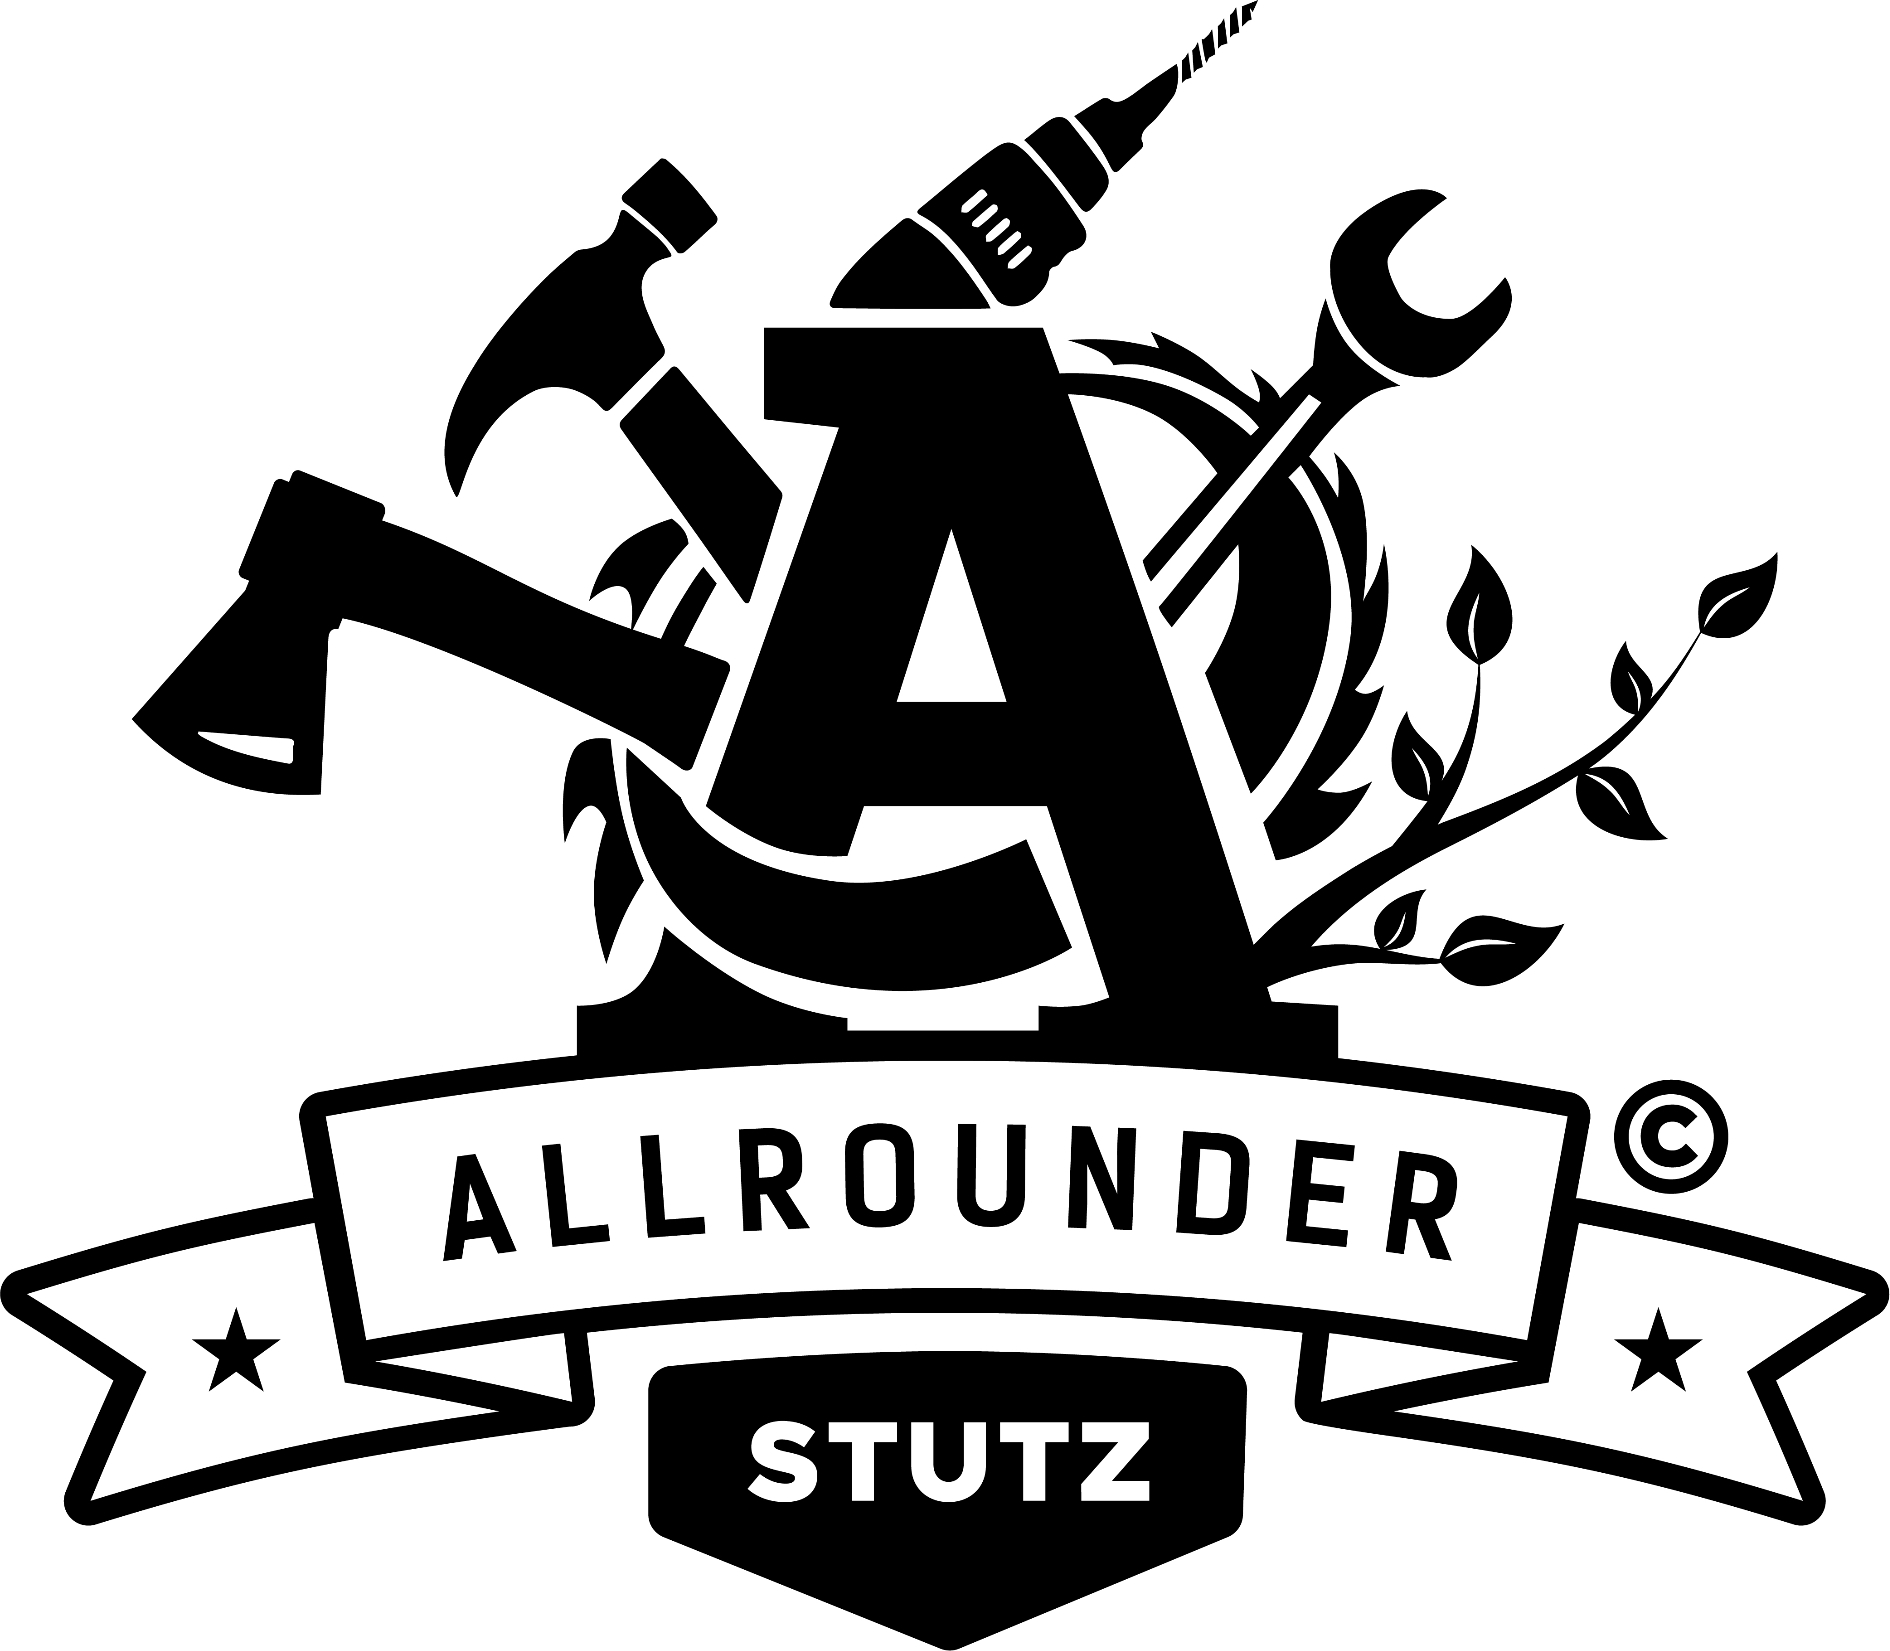 ALLROUNDER STUTZ